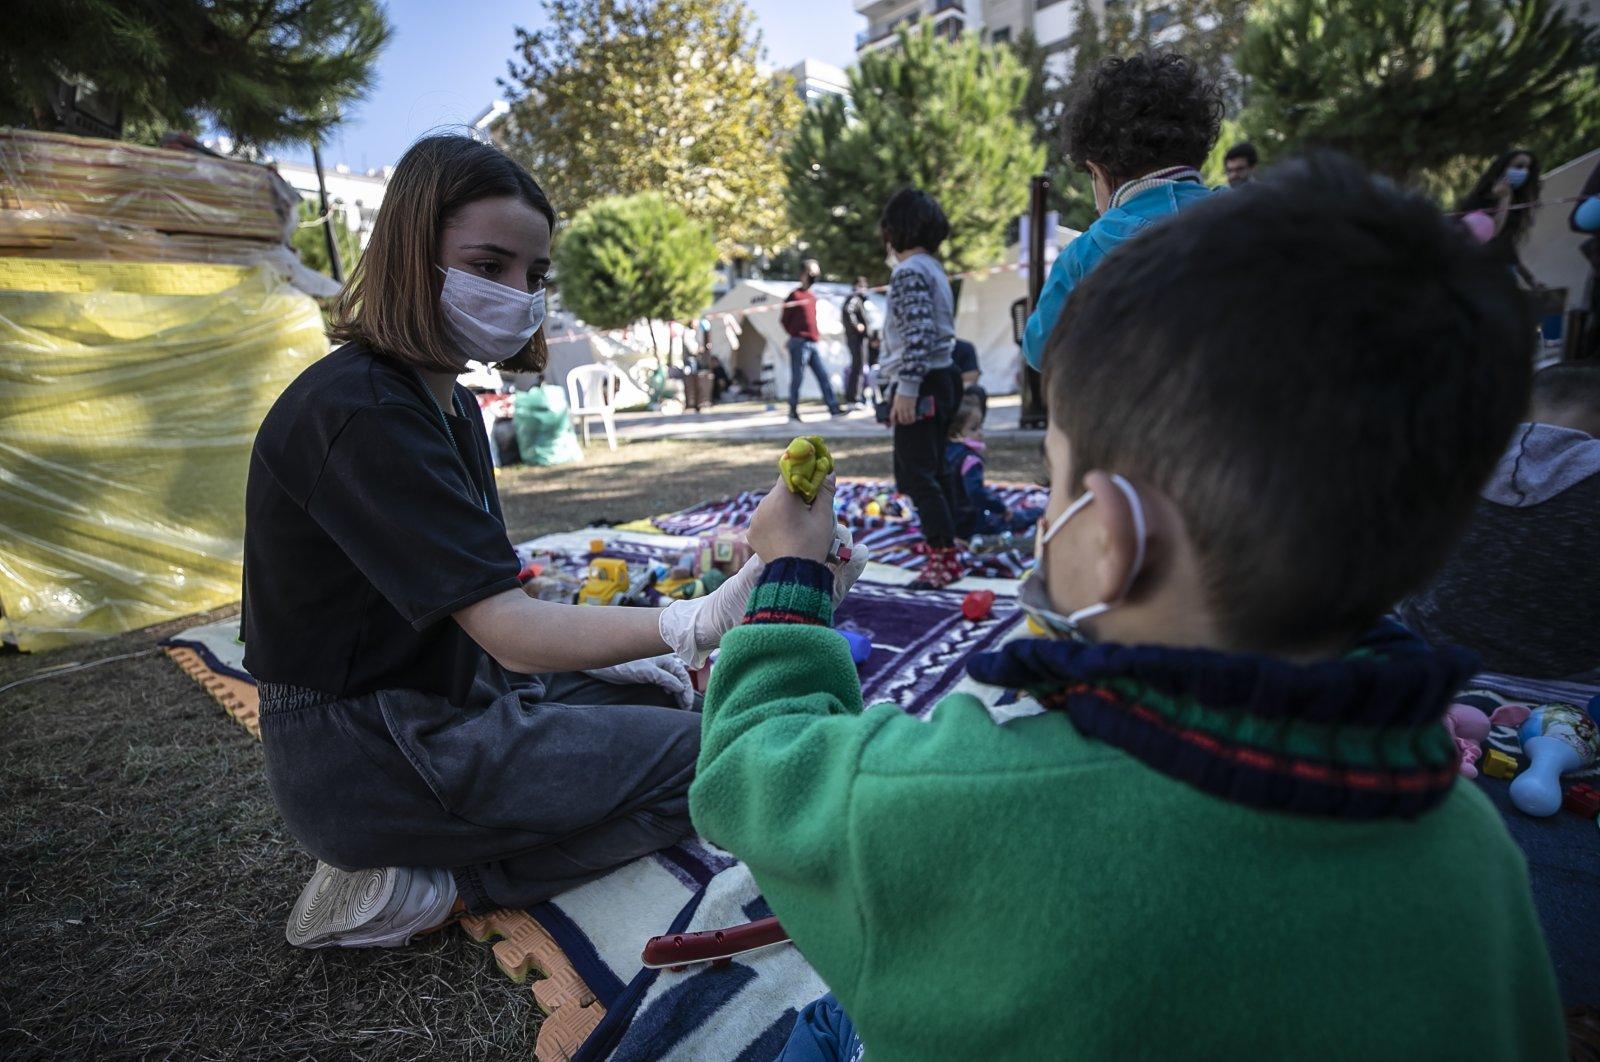 Volunteers play with children at a makeshift activity center in the Bayraklı district, in Izmir, western Turkey, Nov. 4, 2020. (AA Photo)